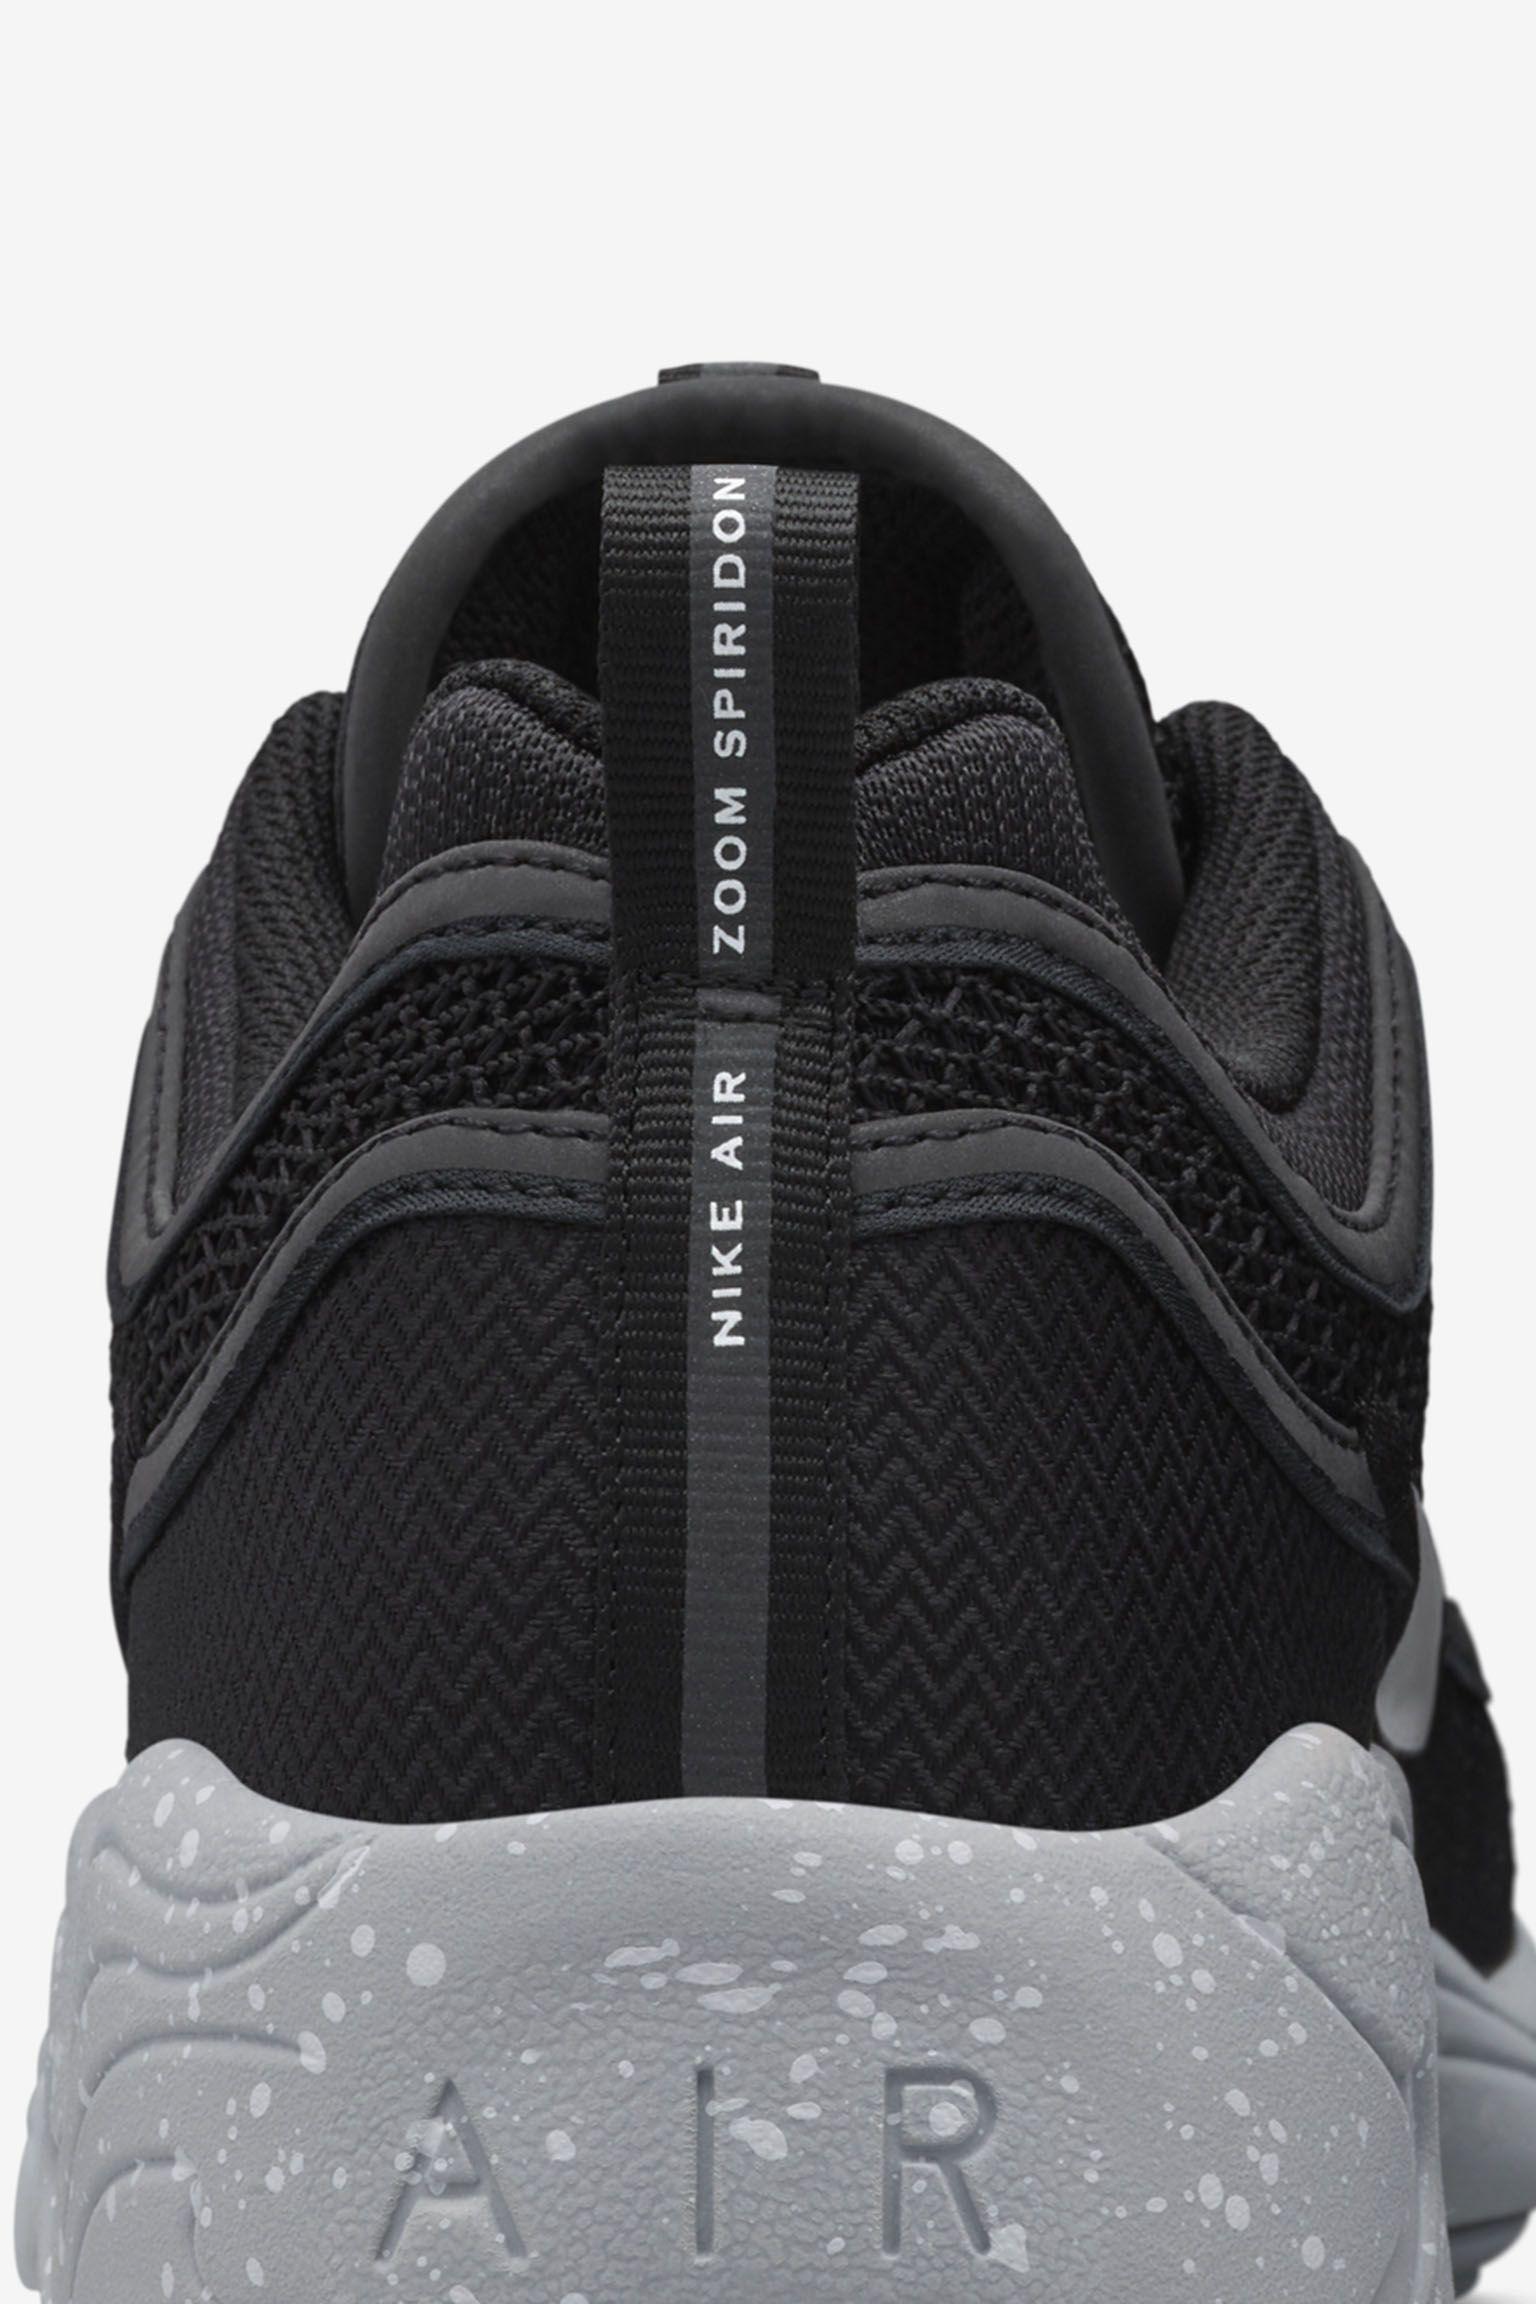 Nike Air Zoom Spiridon 'Black & Grey' Release Date